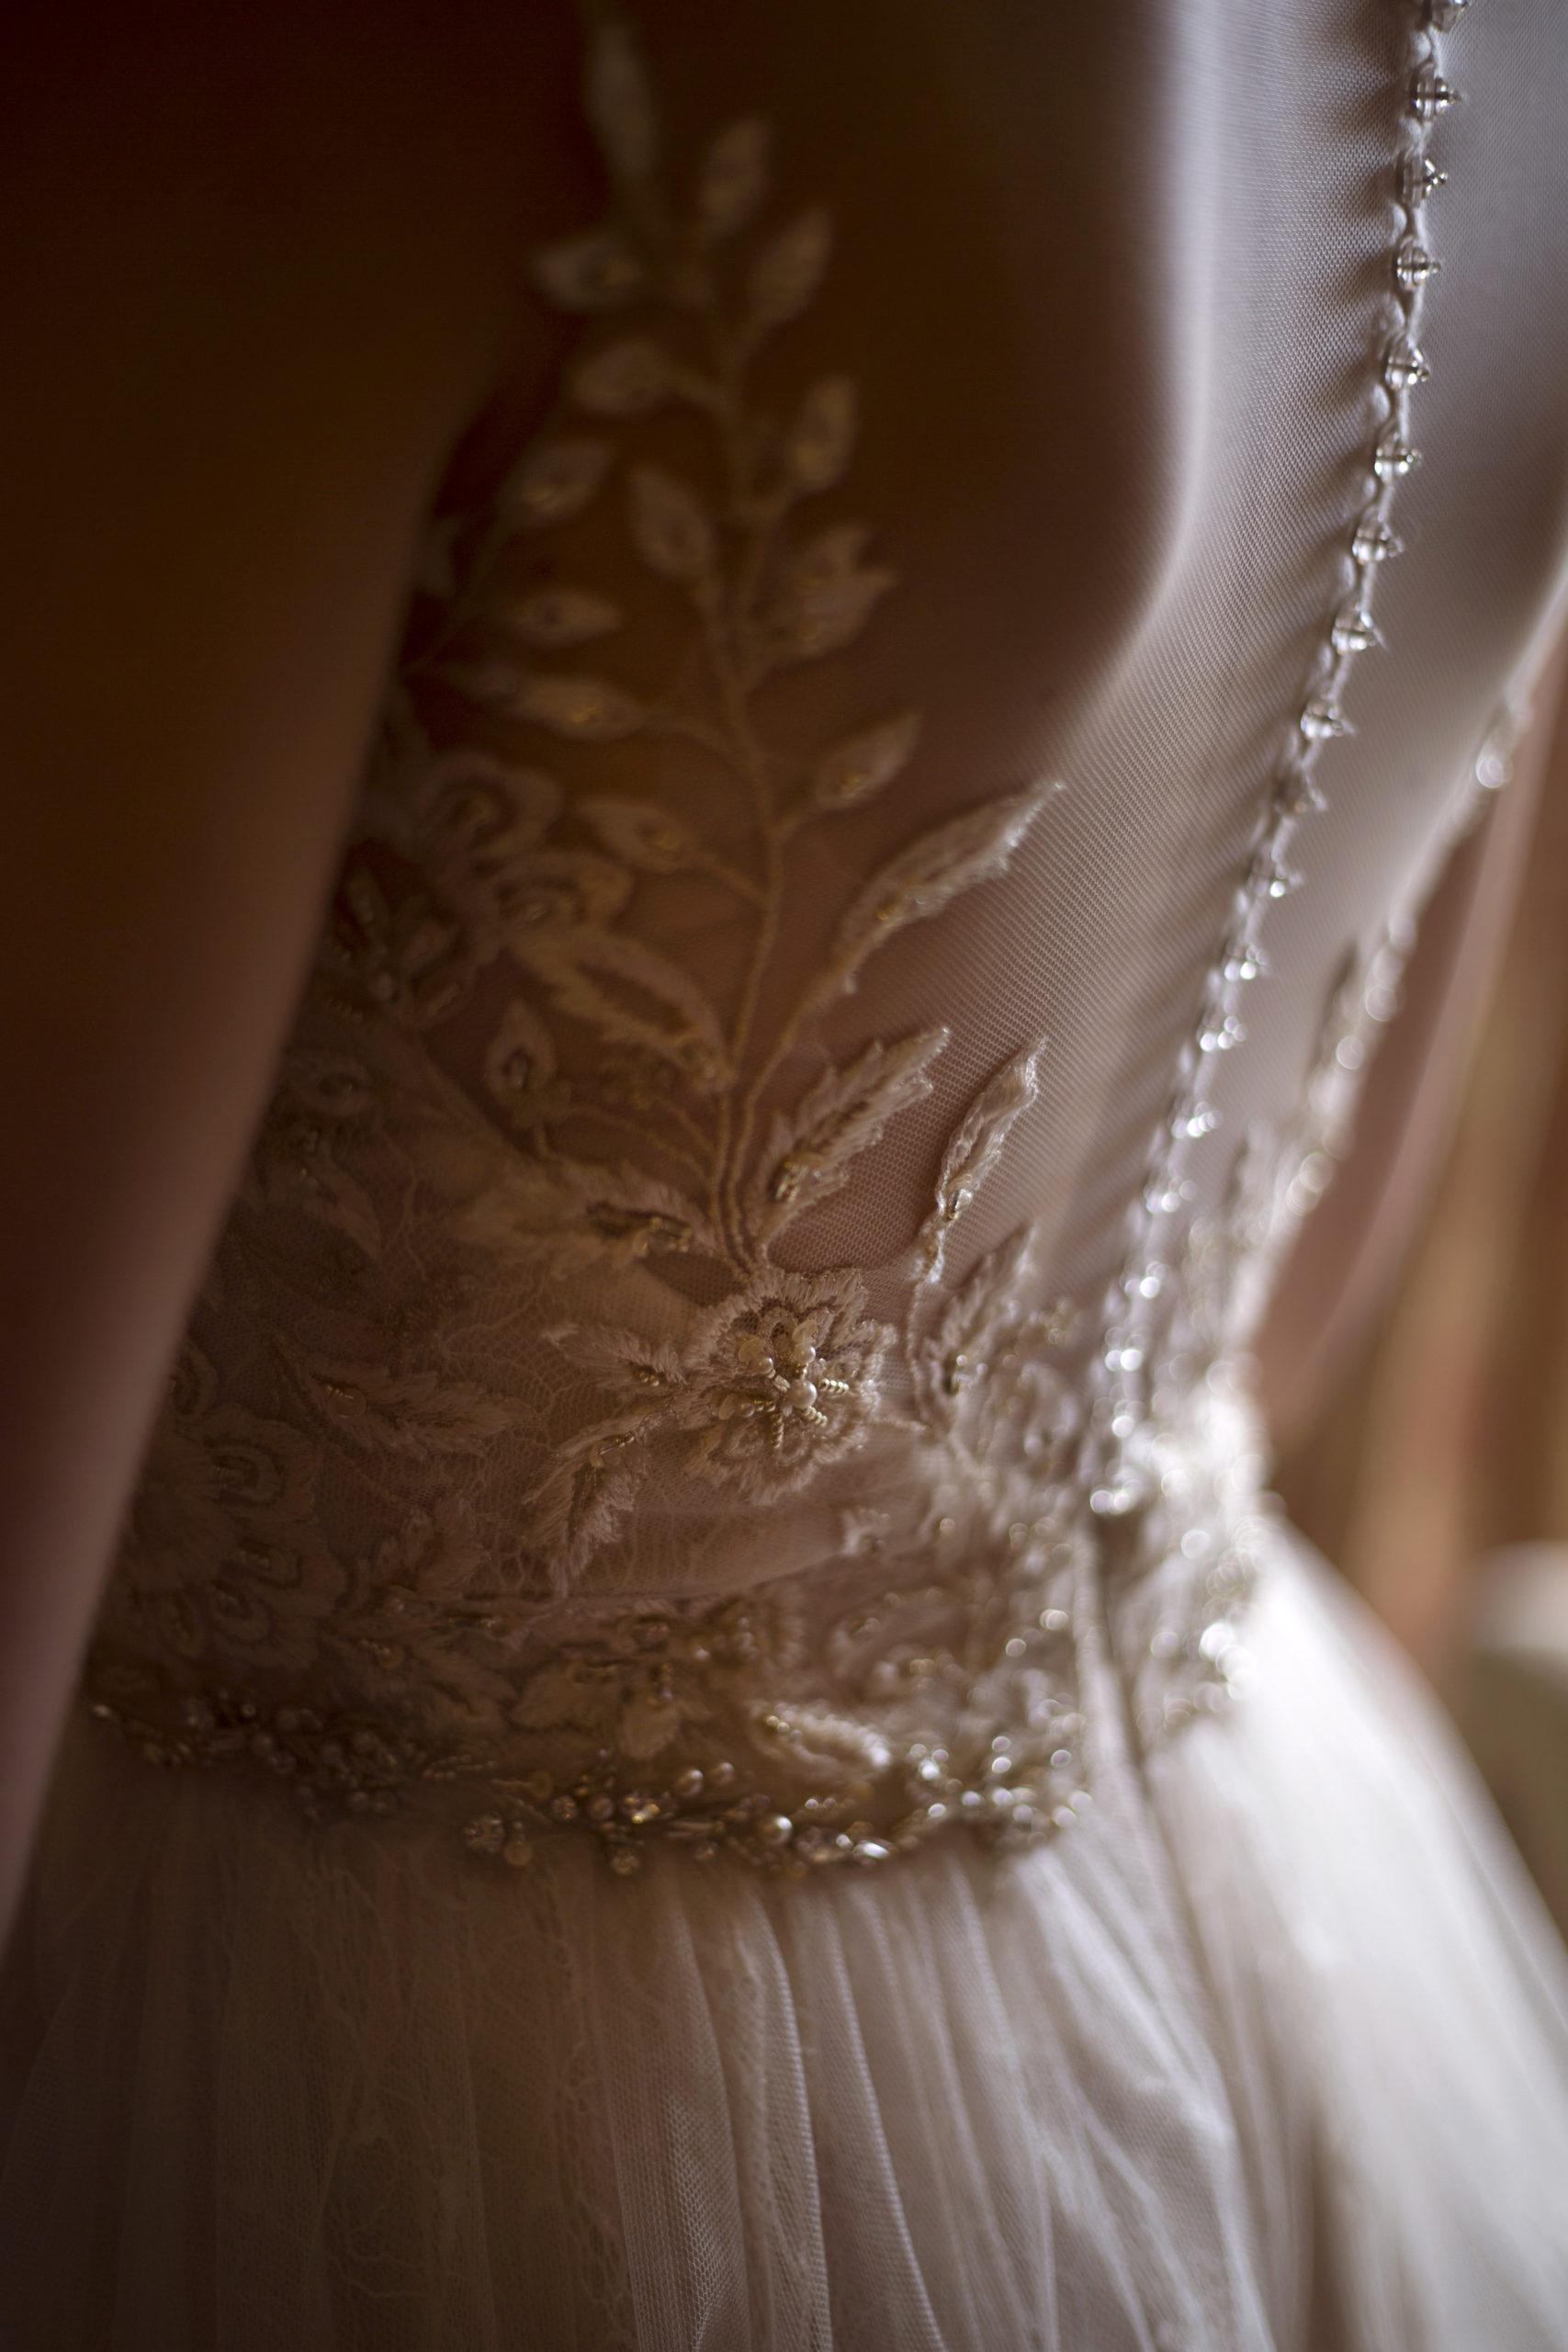 Wedding dress lace leaf detail Cripps barn outdoor wedding photographer